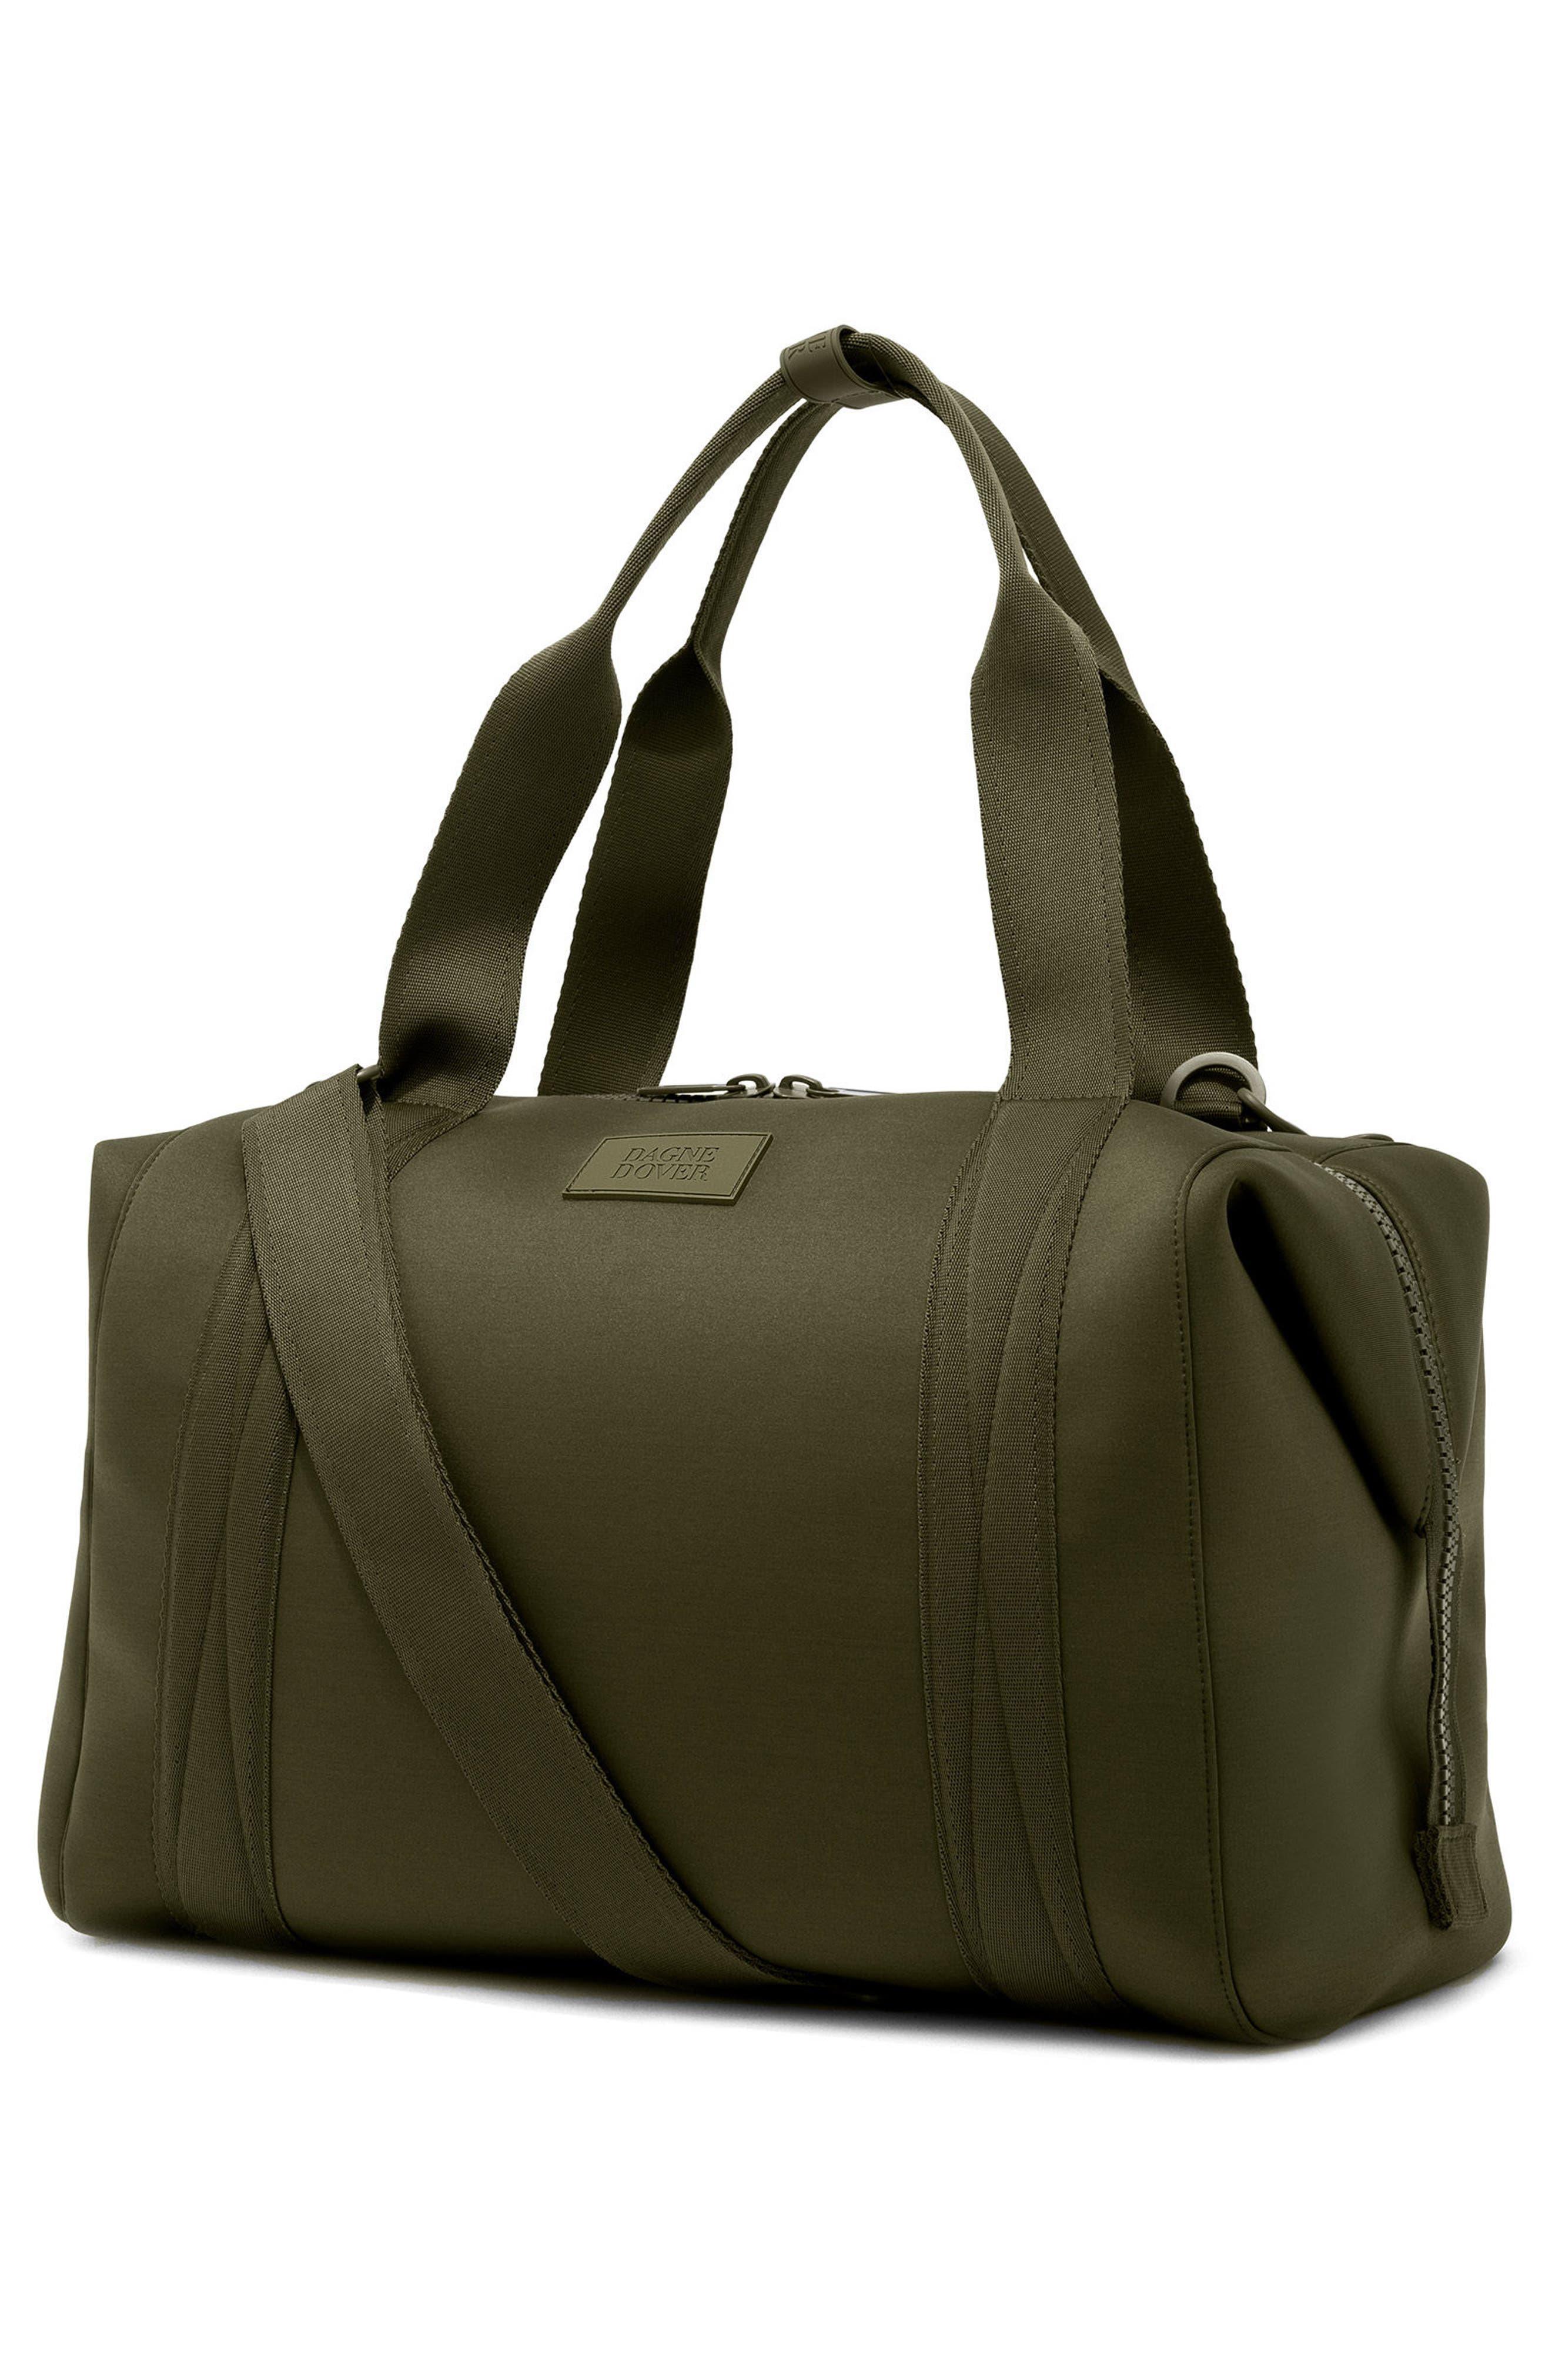 365 Large Landon Neoprene Carryall Duffel Bag,                             Alternate thumbnail 22, color,